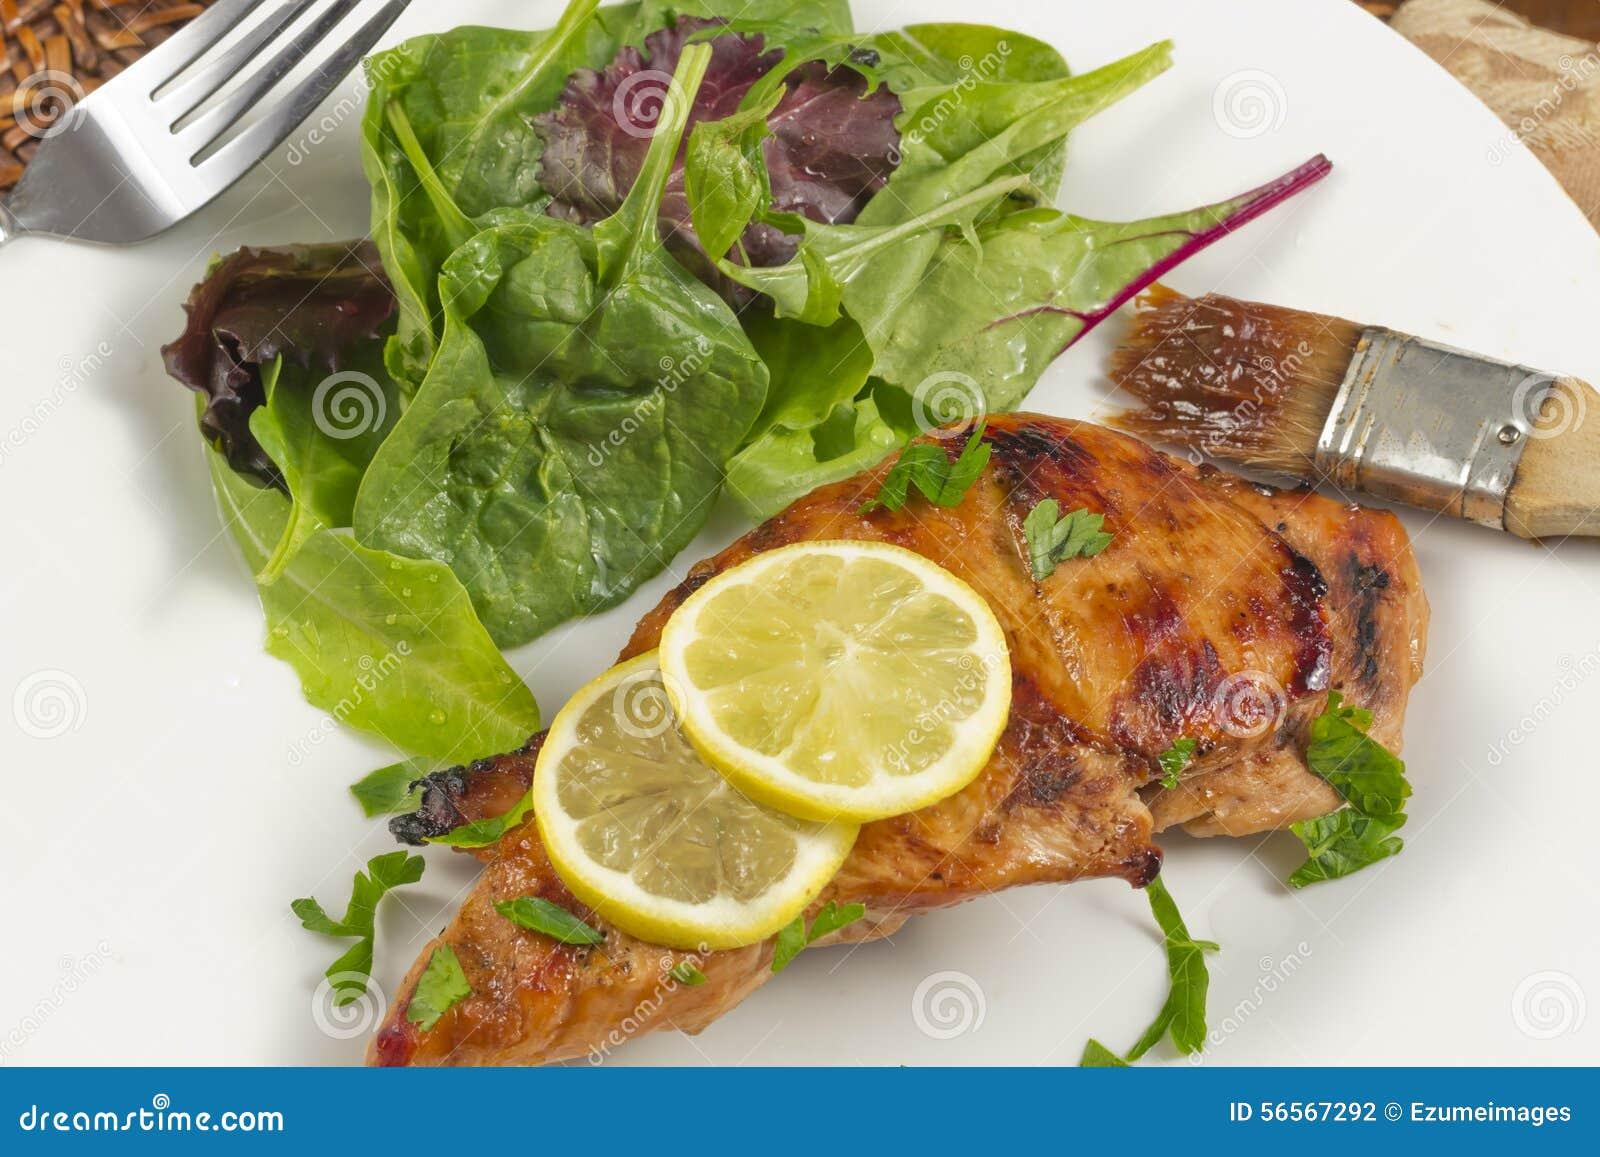 Download κοτόπουλο στηθών που ψήνεται στη σχάρα Στοκ Εικόνες - εικόνα από εύκολος, κοτόπουλο: 56567292